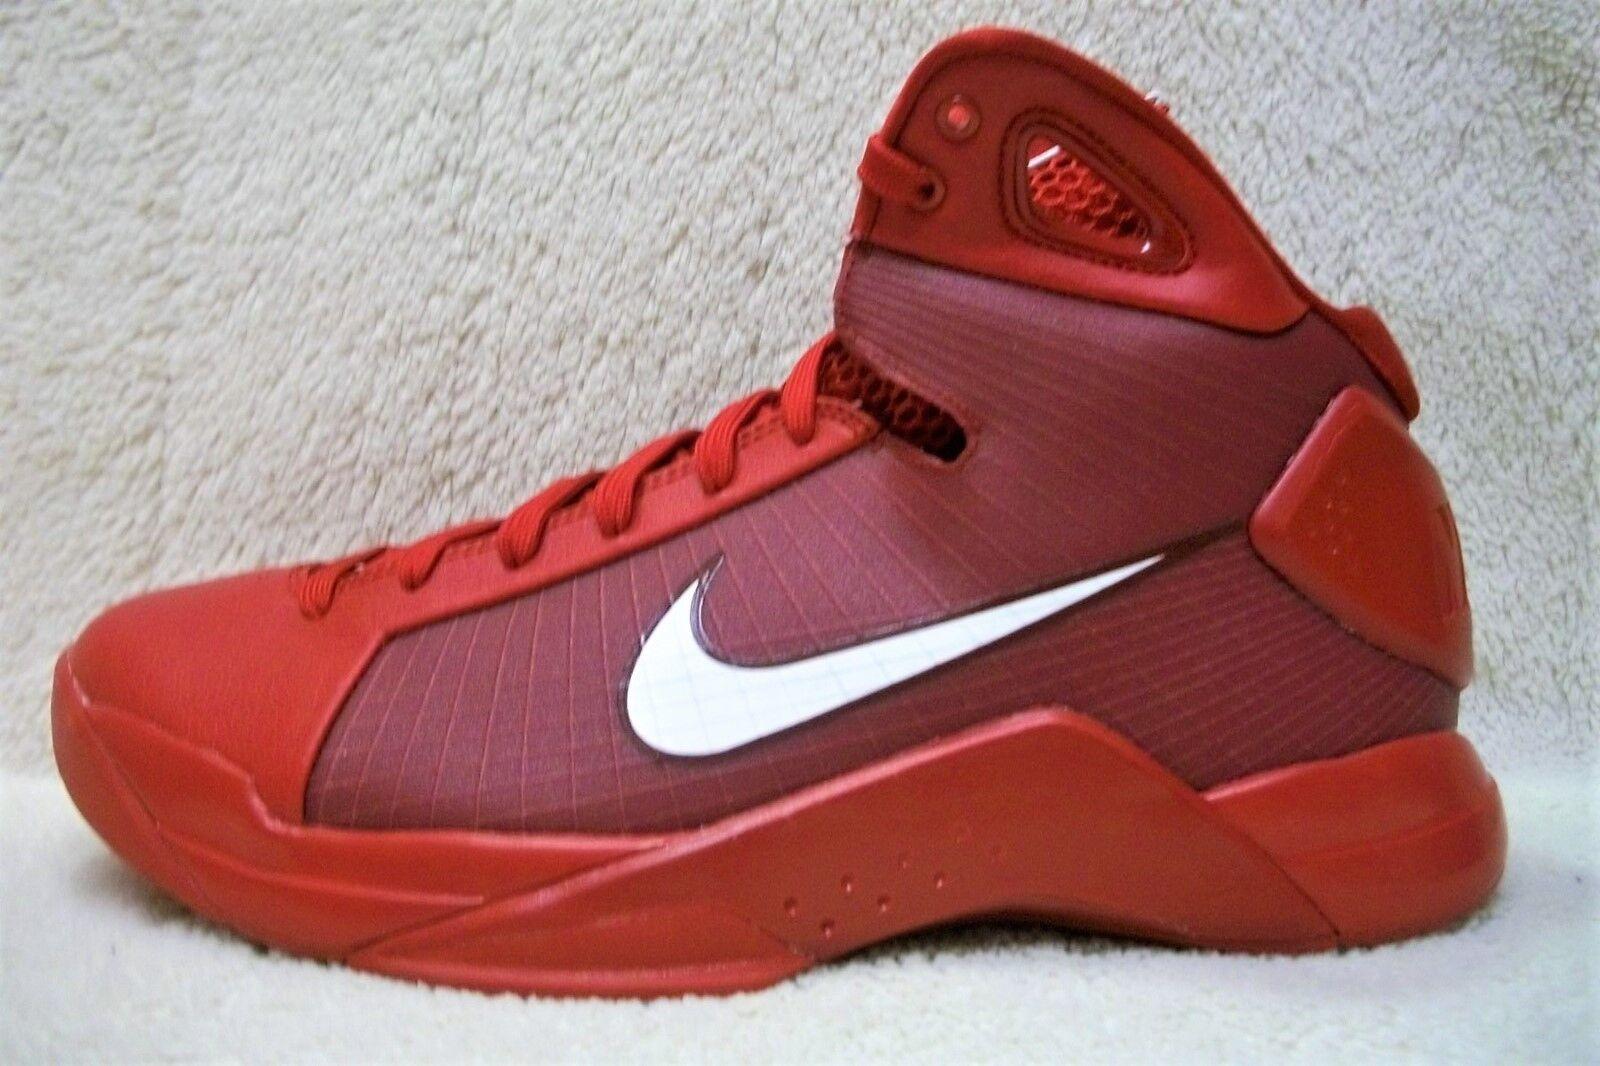 Nike hyperdunk '08 - team rot mfg ab 150 dollar